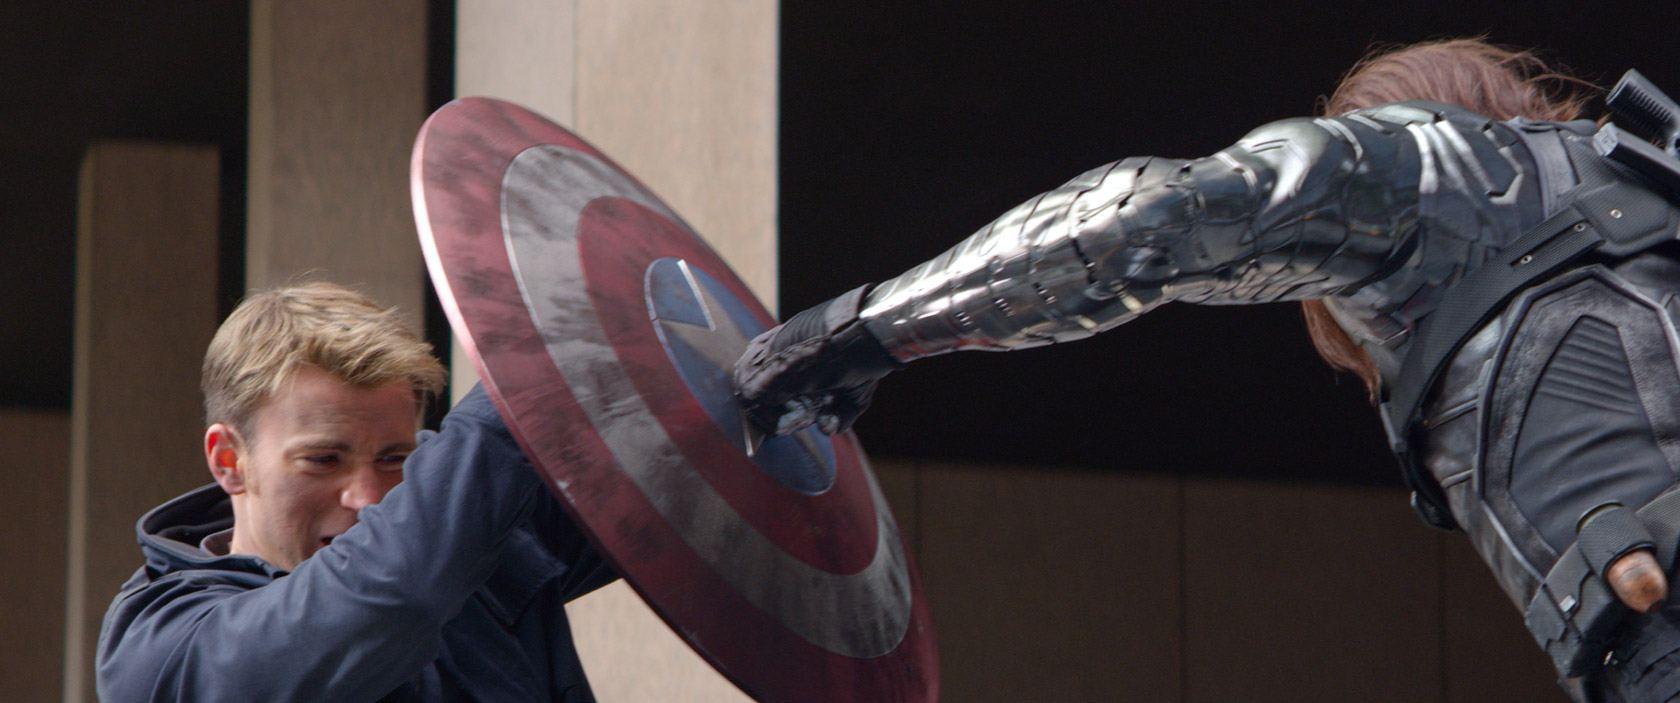 Chris Evans and Sebastian Stan in Captain America: The Winter Soldier